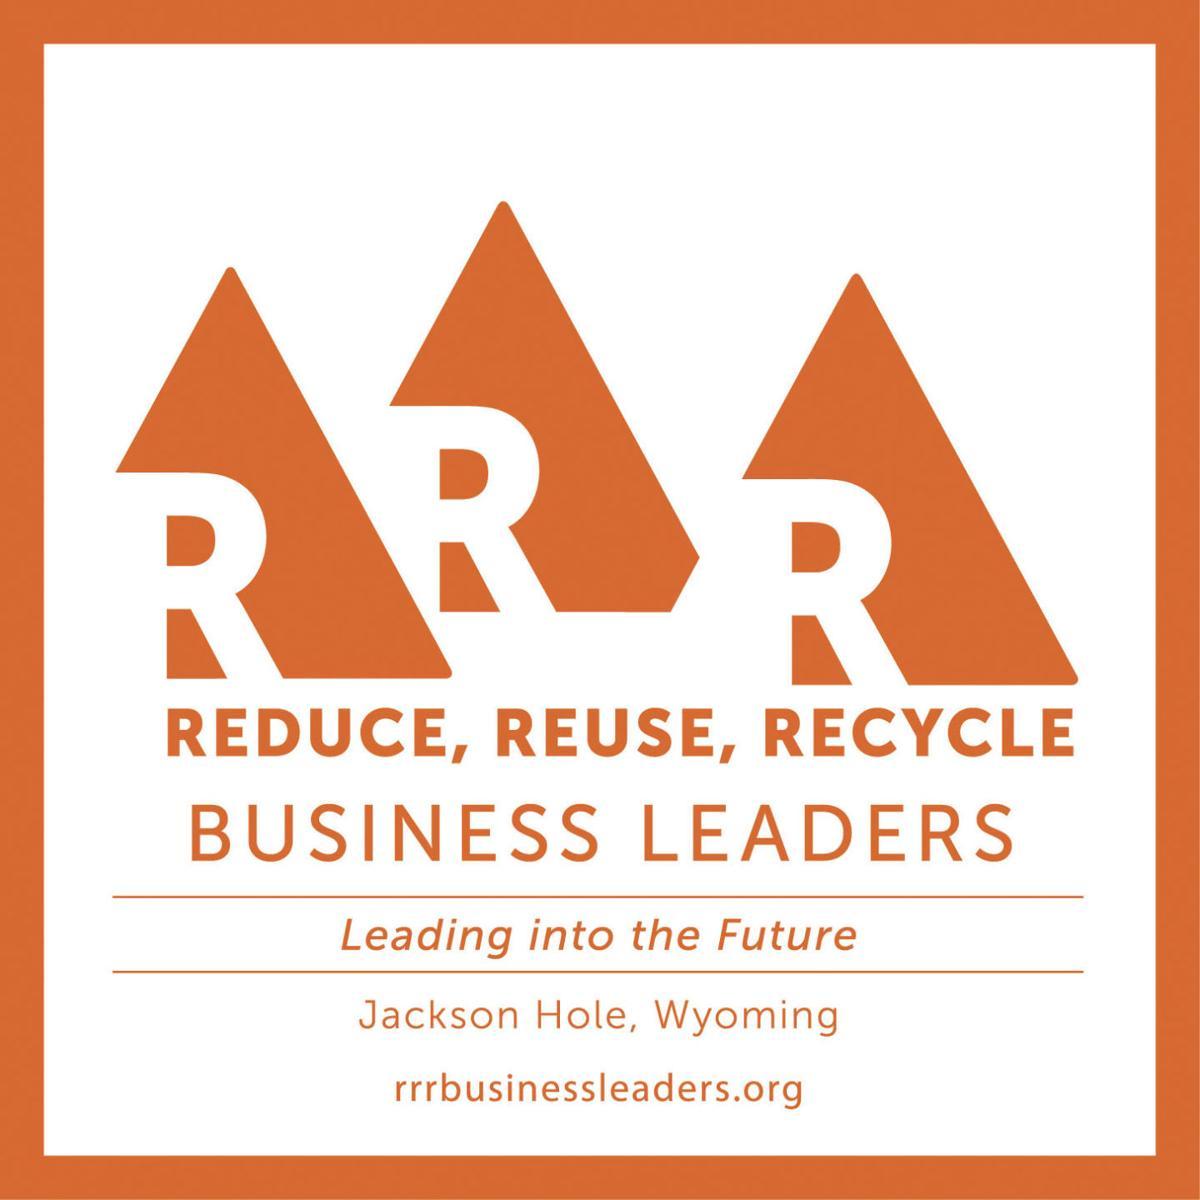 RRR Business Leaders